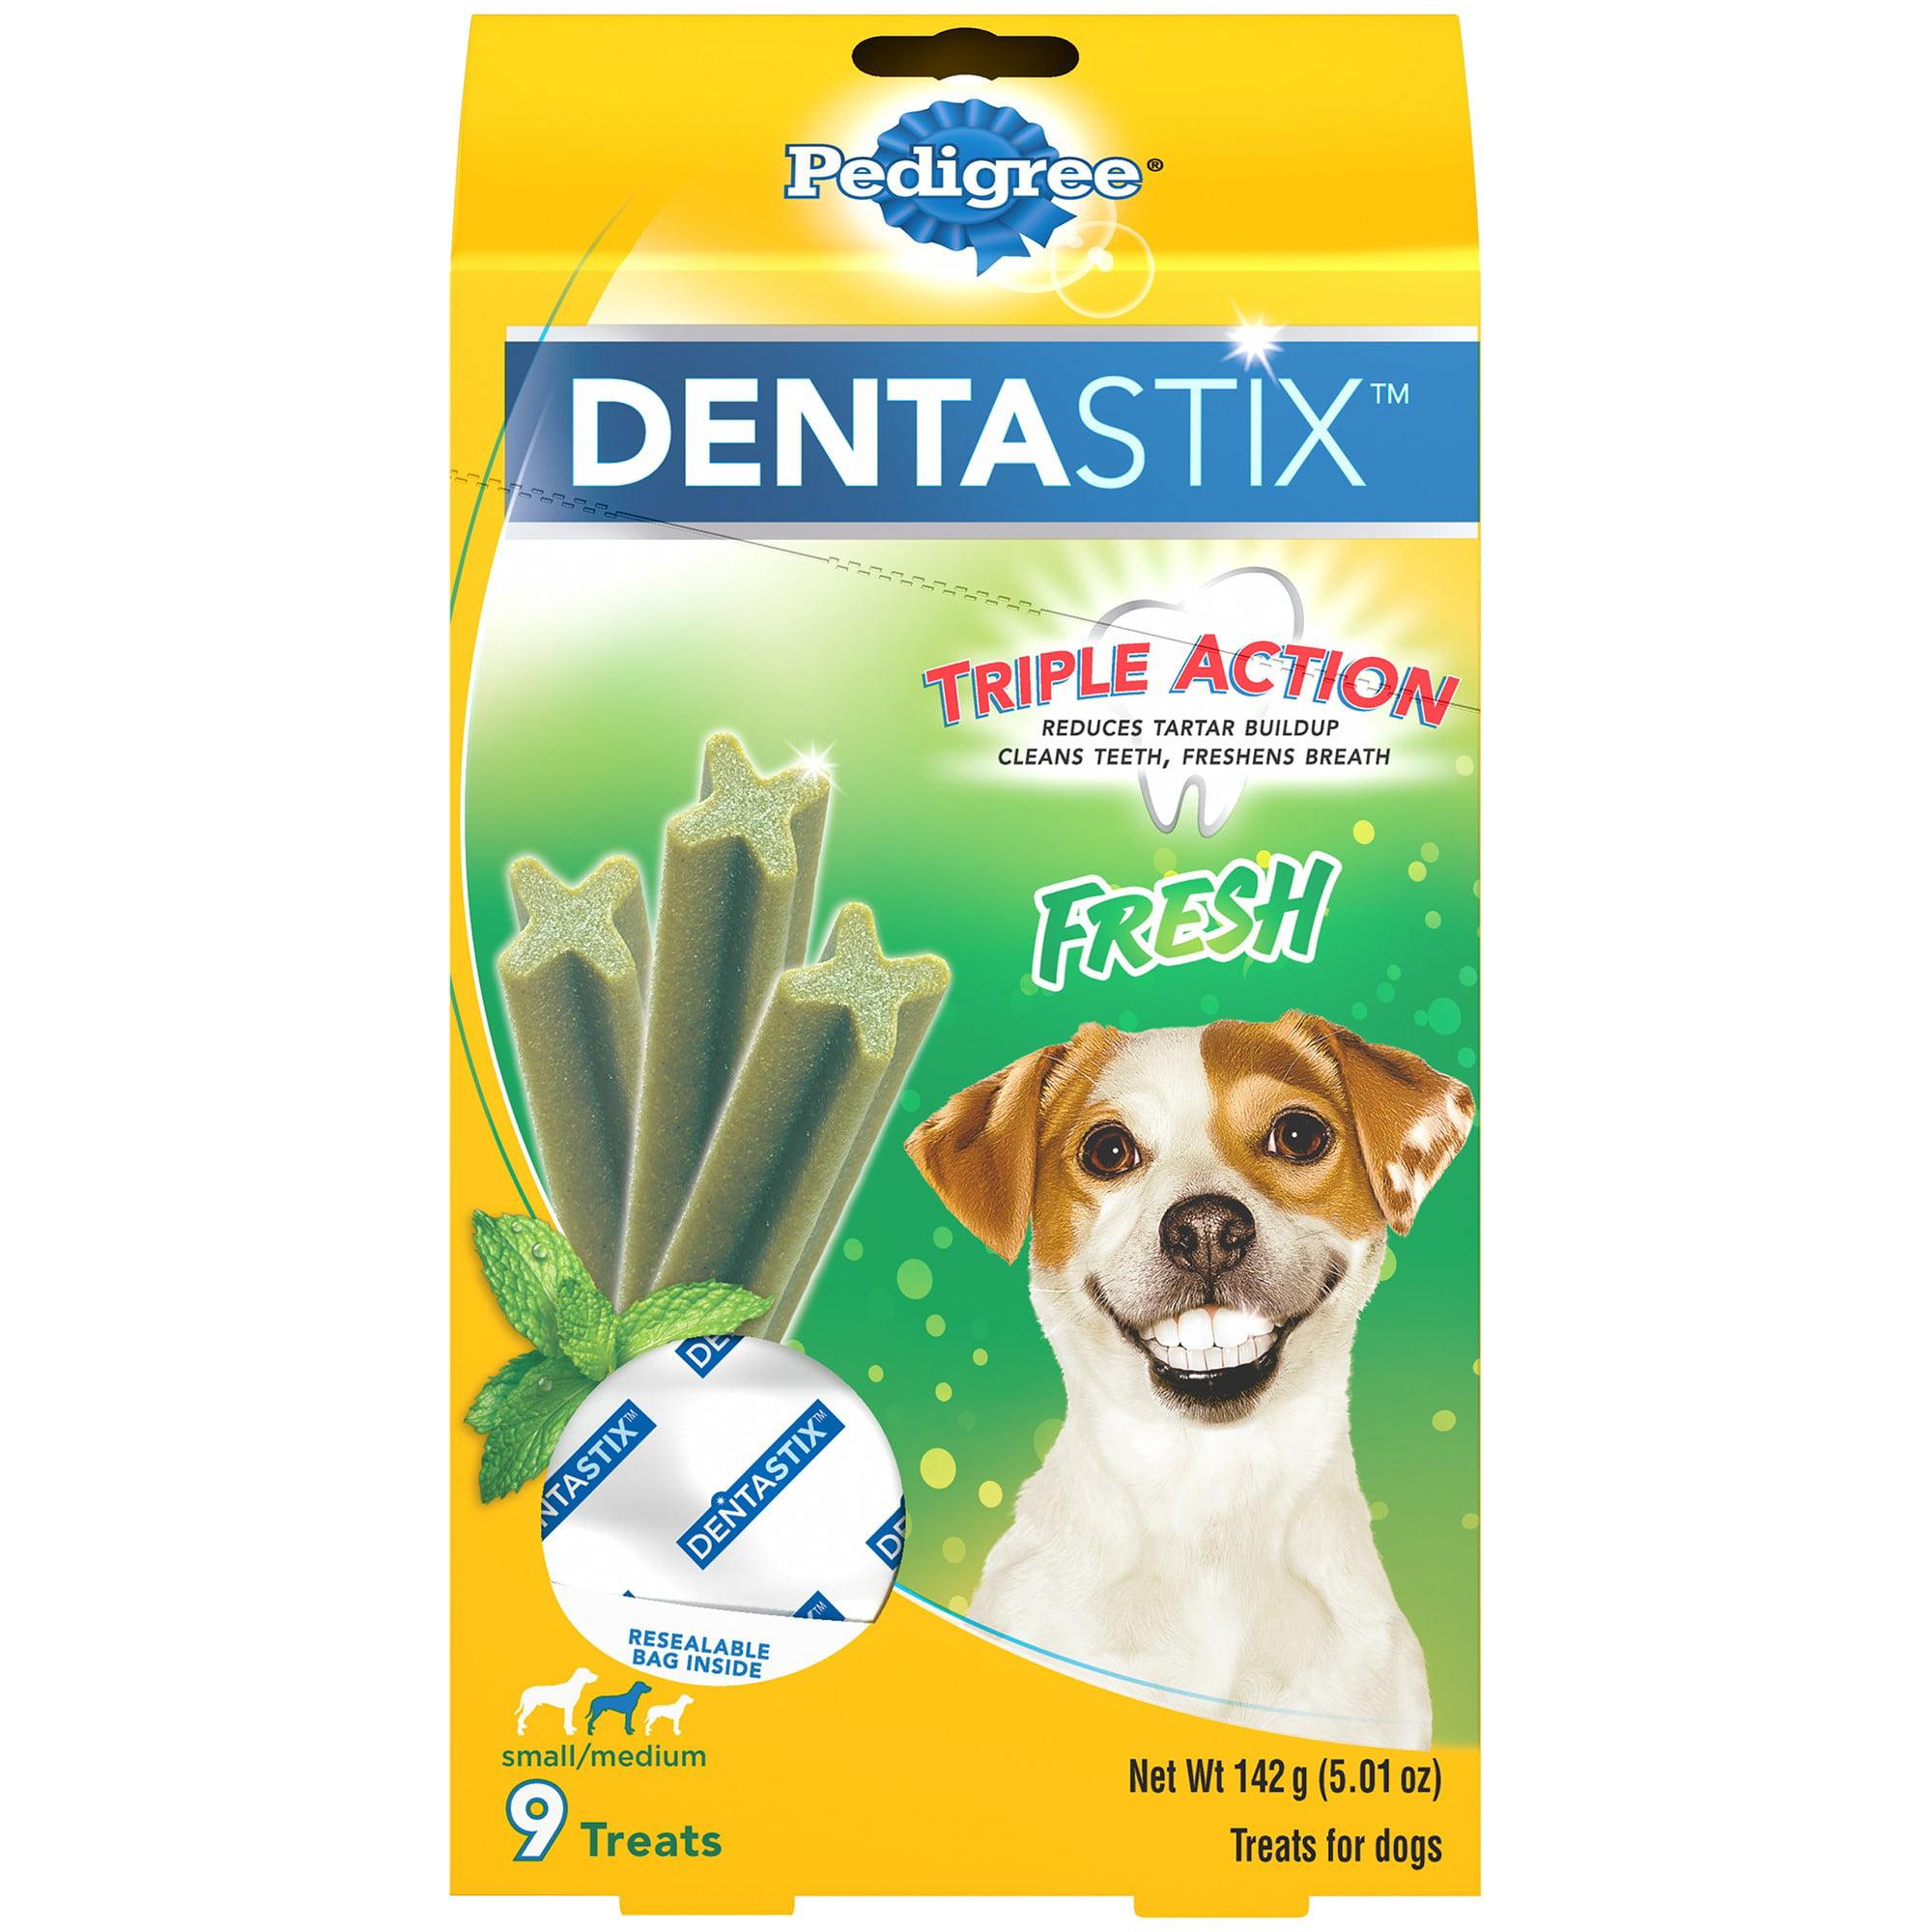 Pedigree Dentastix Small/Medium Fresh Dog Treats, 9-count